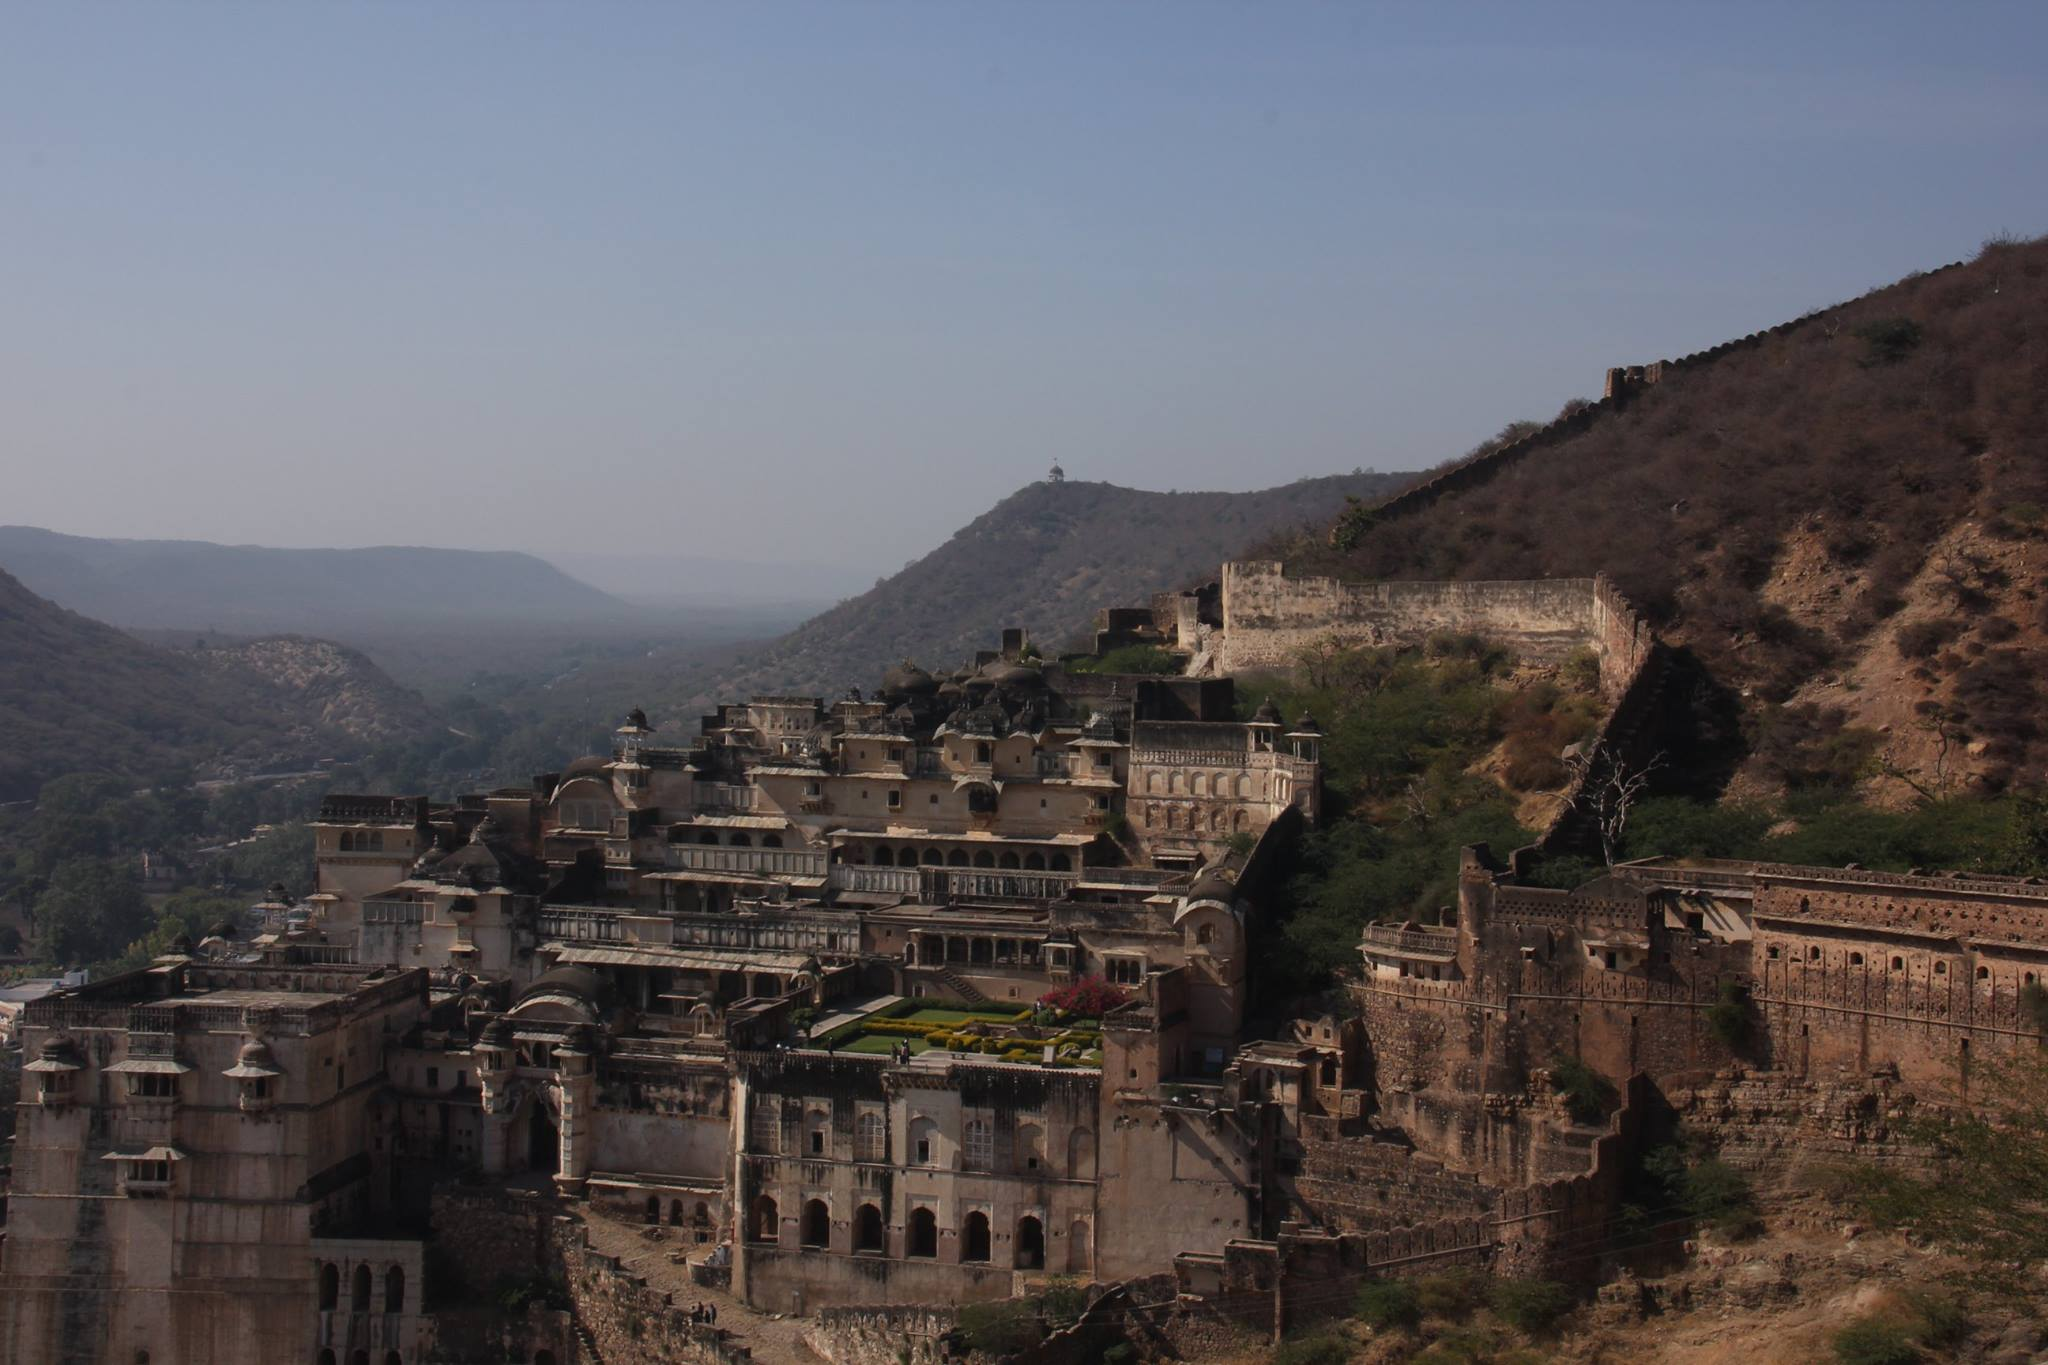 #Incredibleindia #Indiatourism #India #Rajasthantourism #Bundi #Bundifort